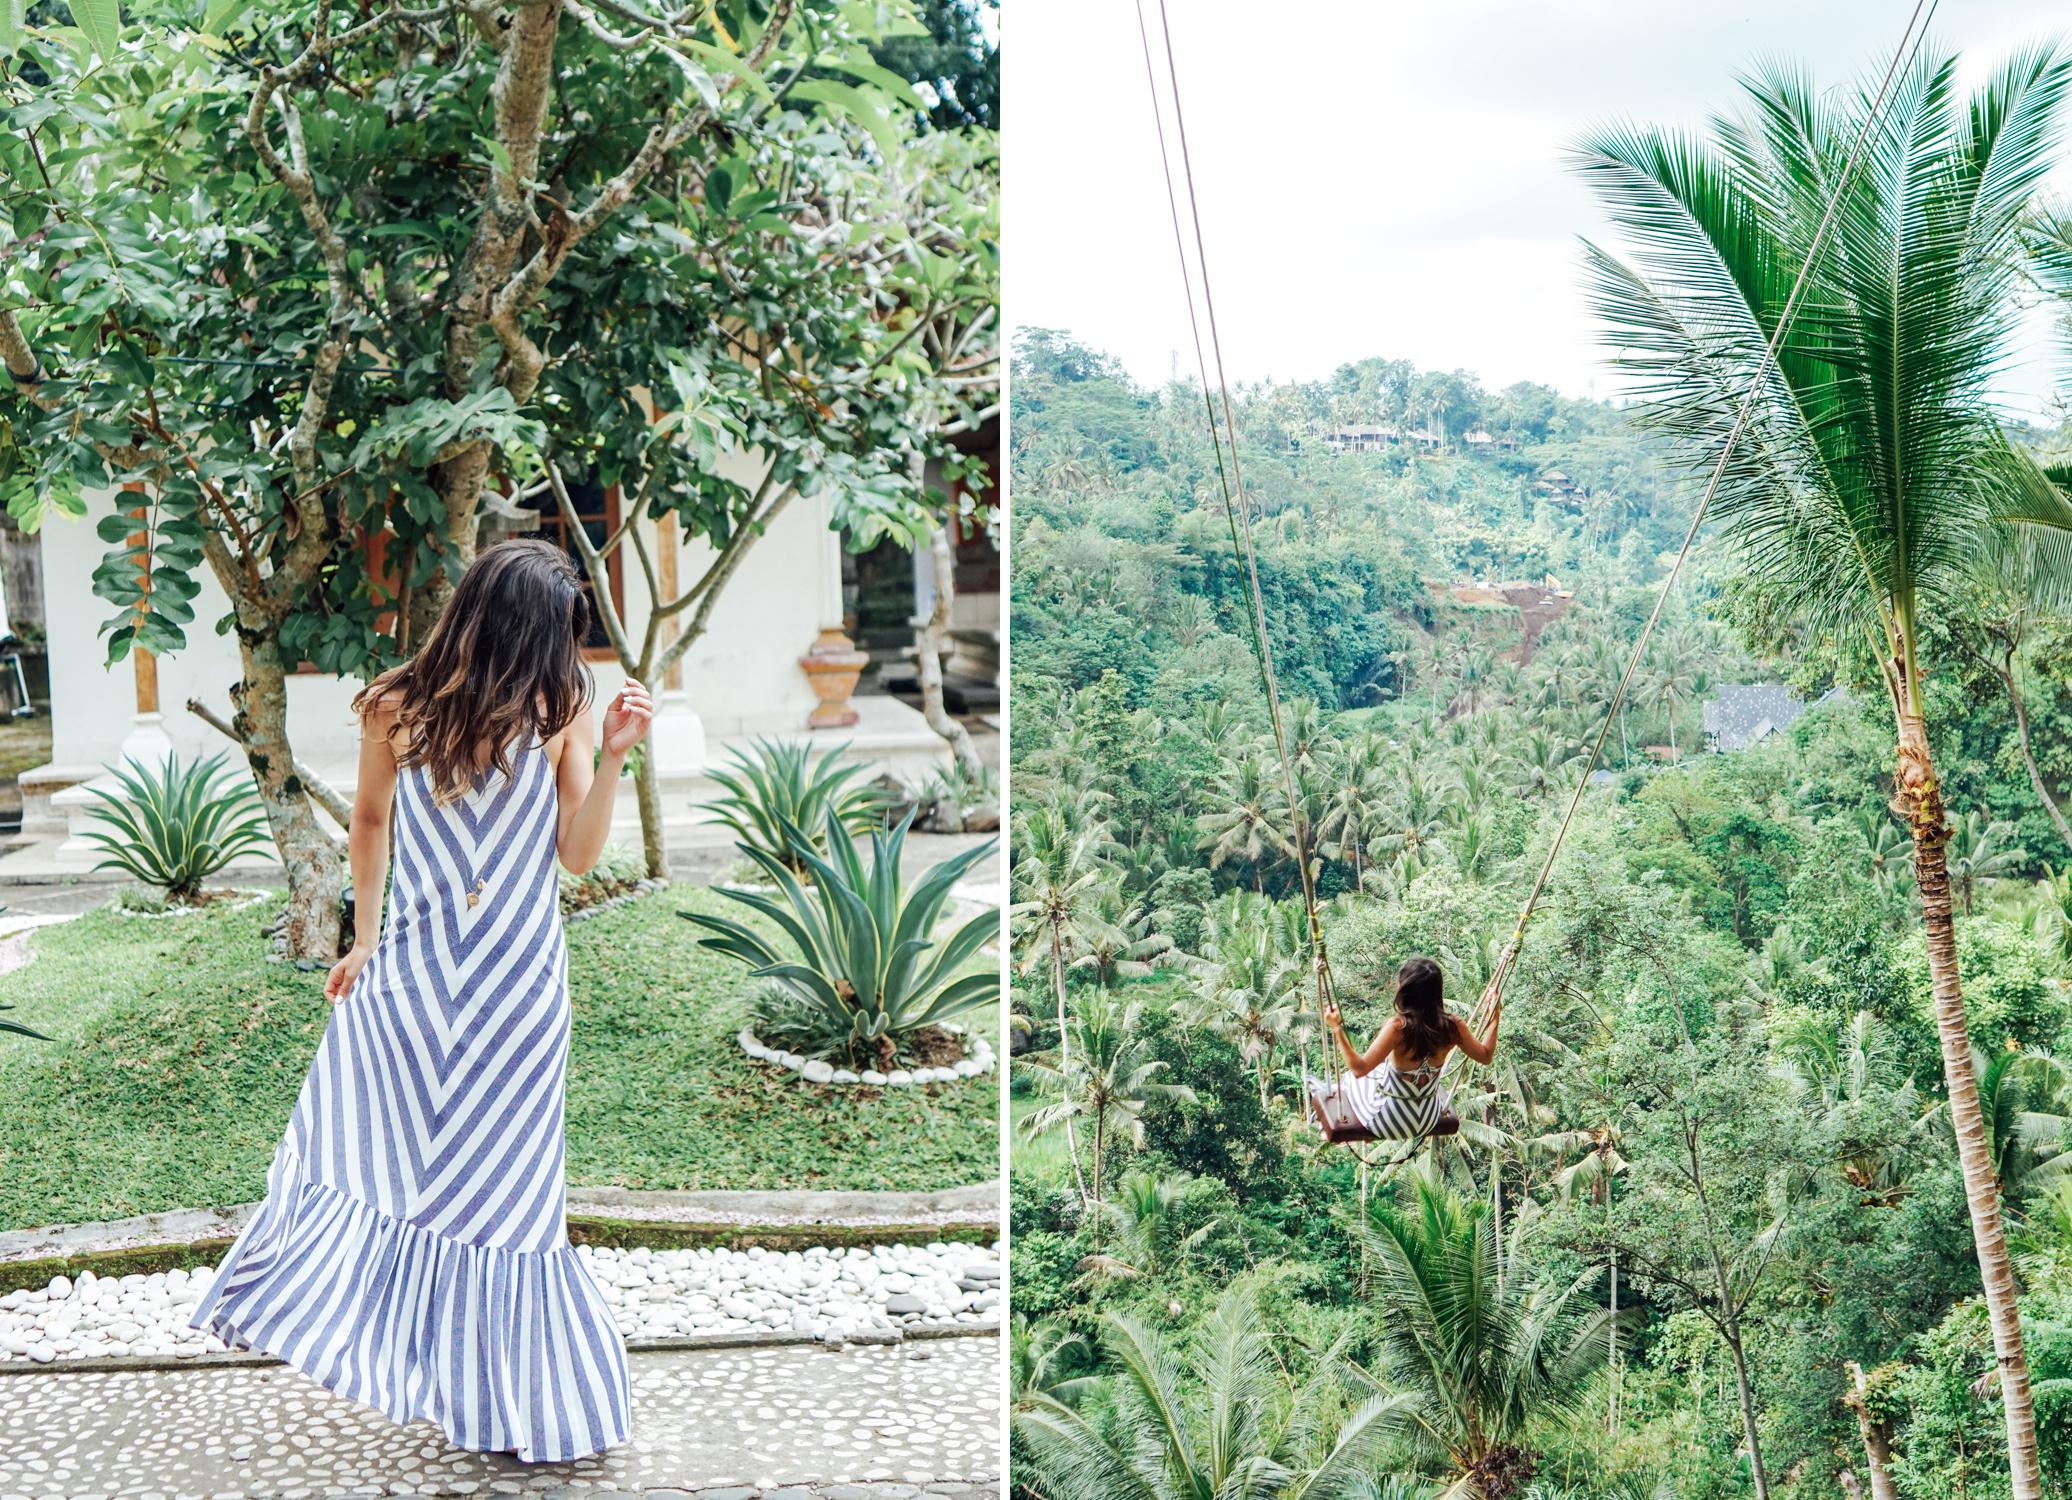 Bali Travel Guide: Ubud, Bali Swing